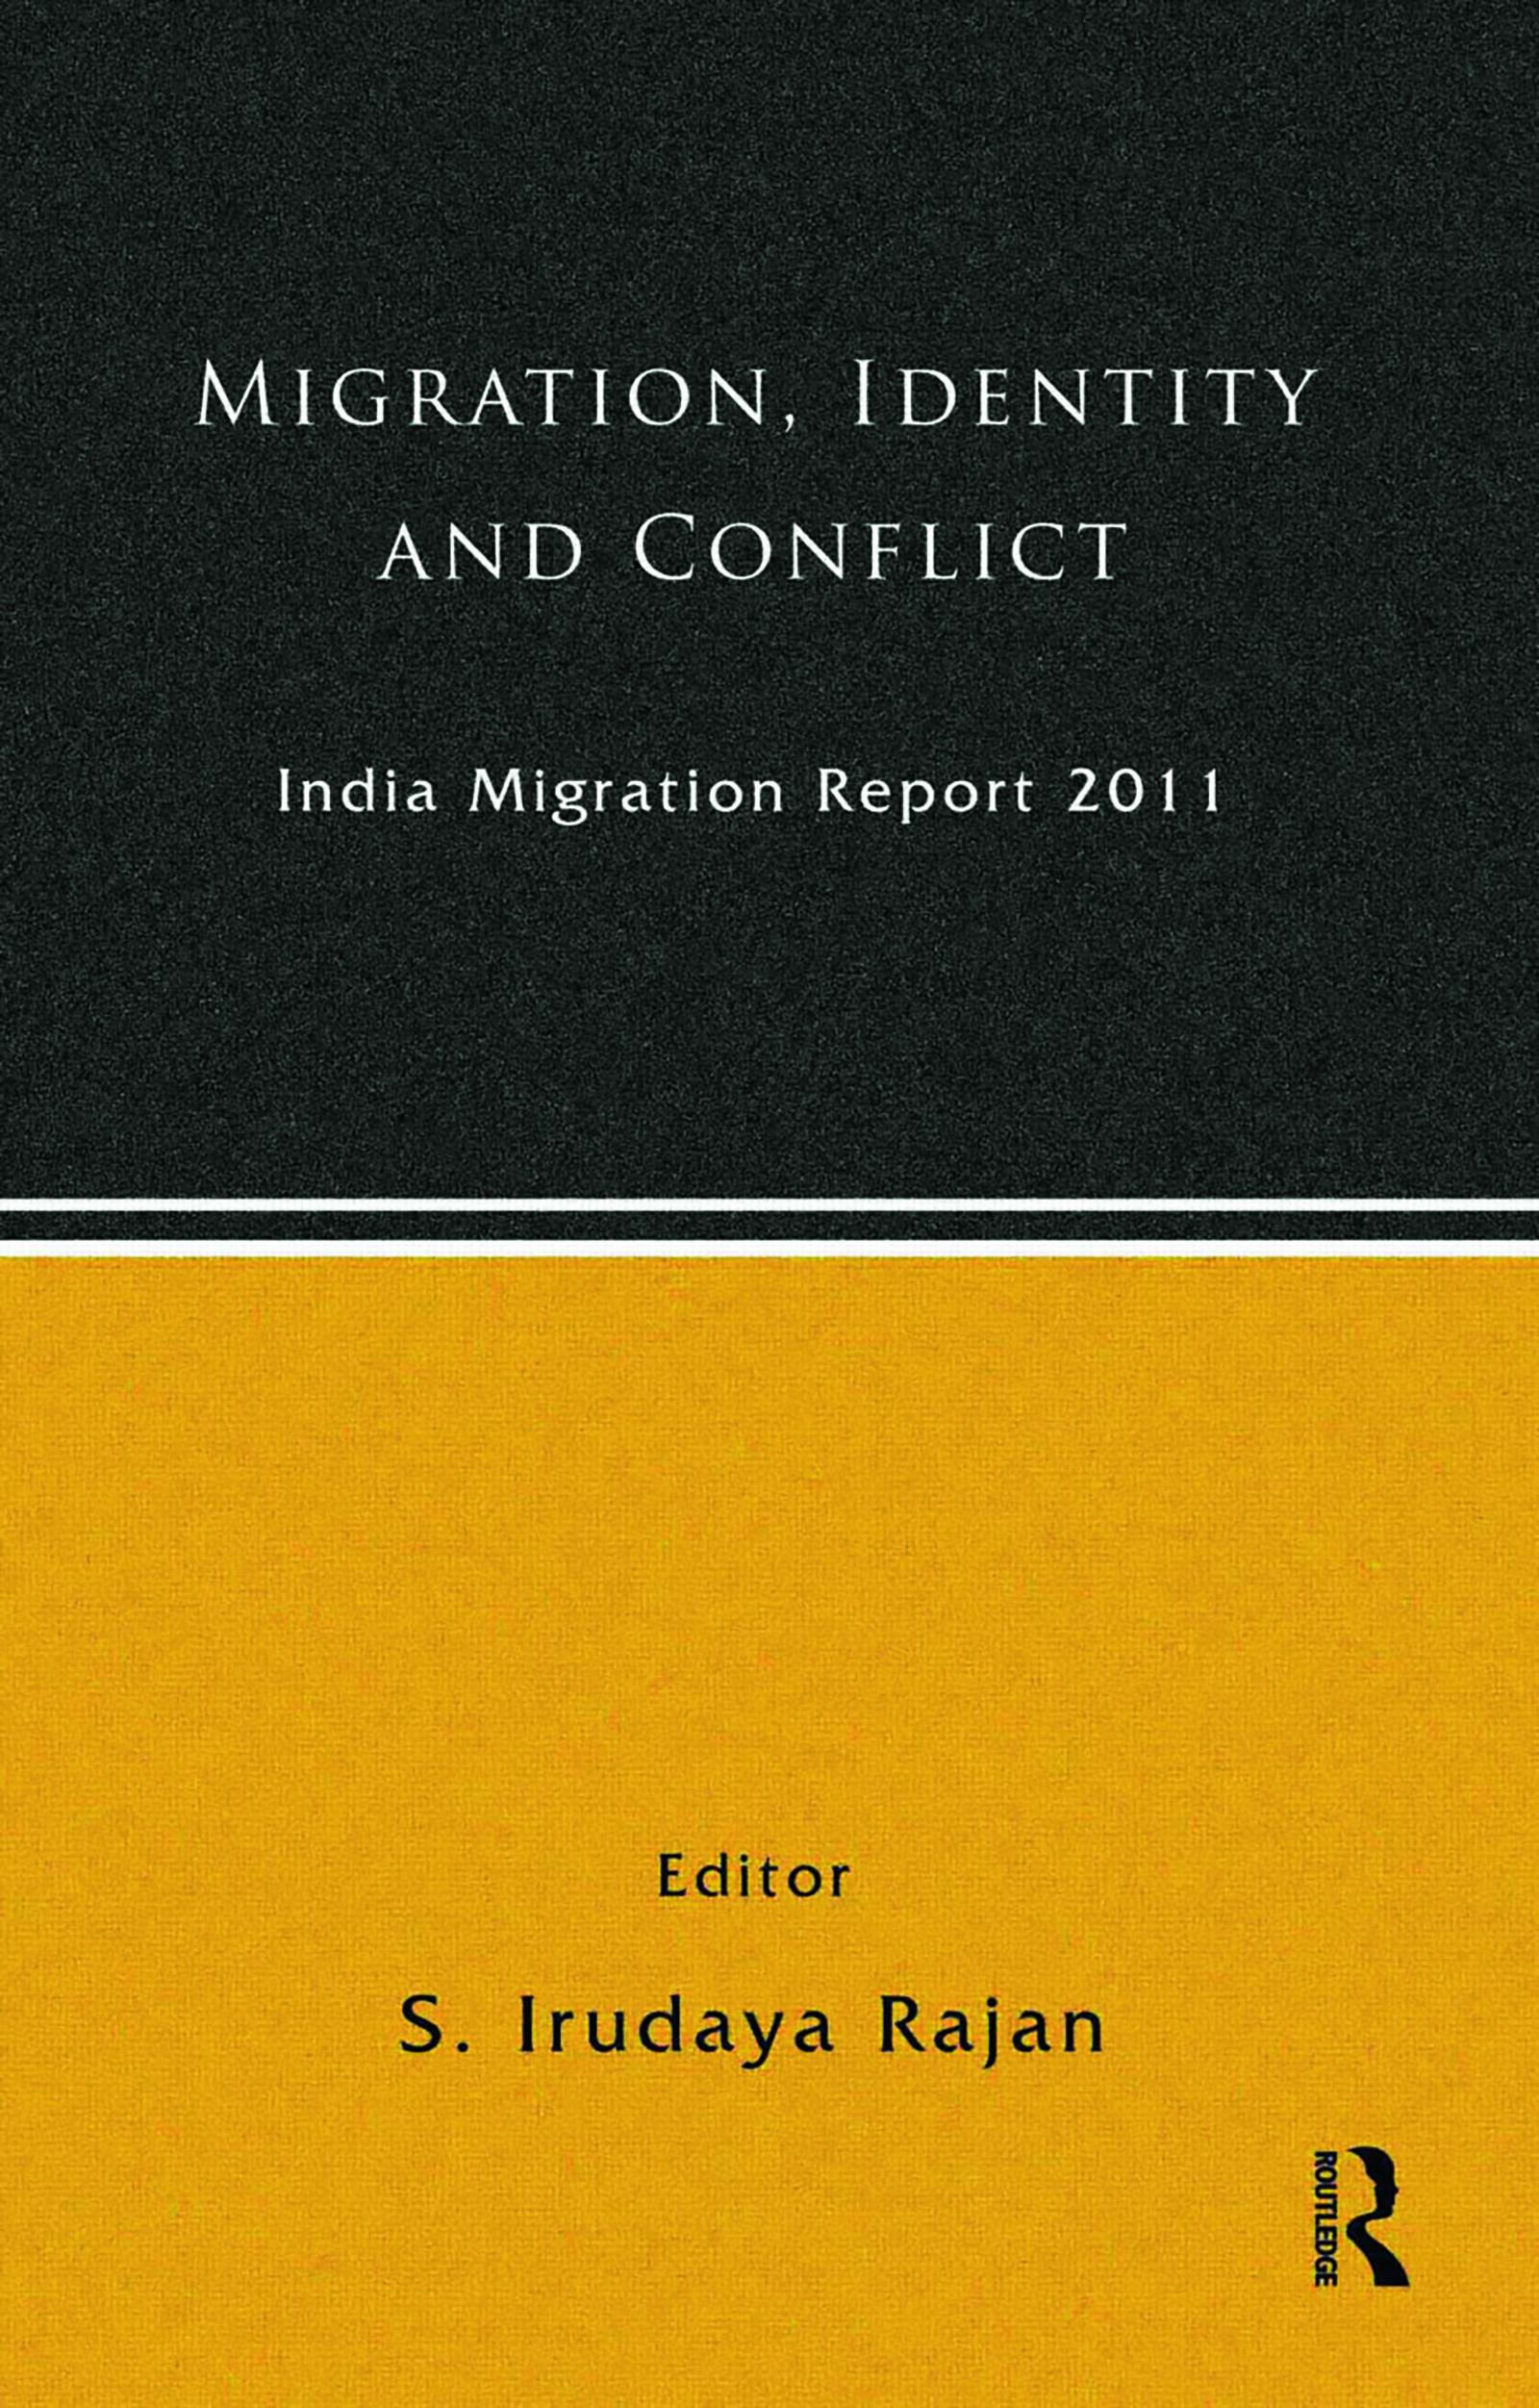 India Migration Report 2011